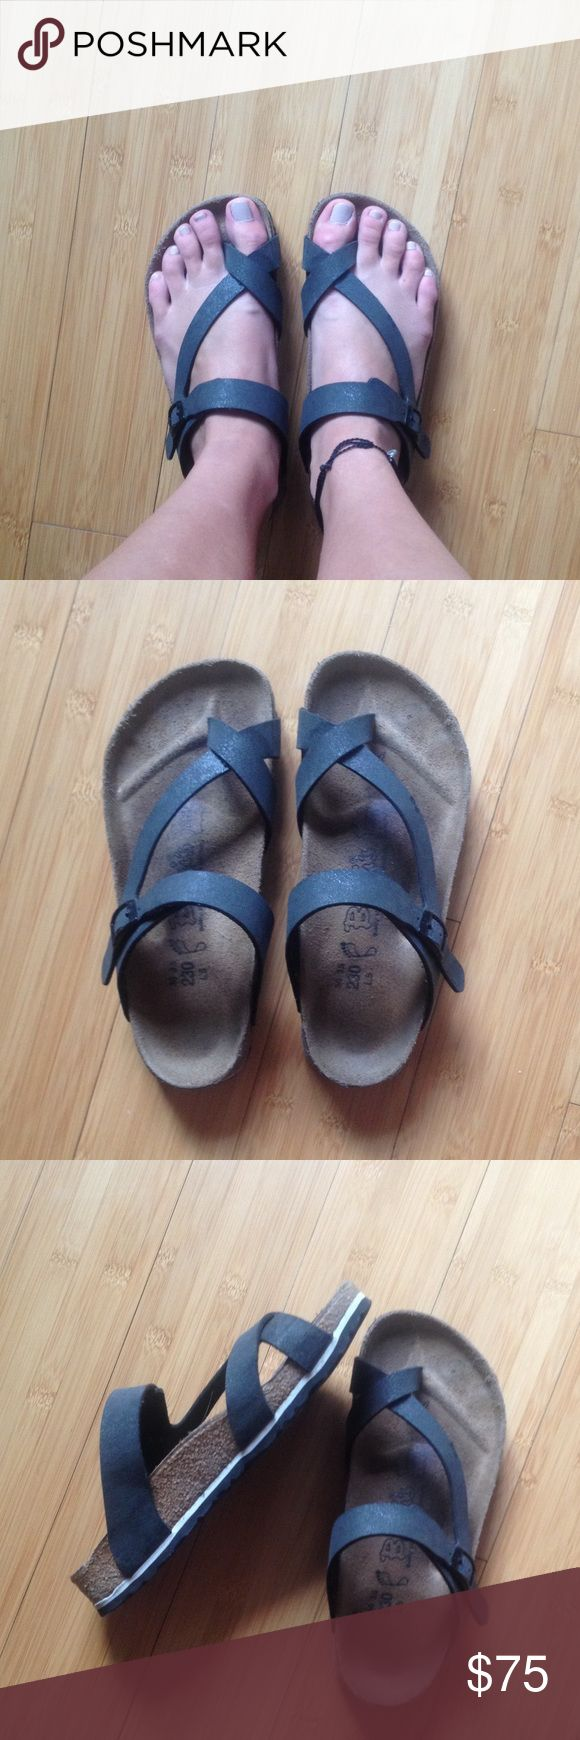 Birki's by Birkenstock sandals Black. Size:36 35, 230, L5. Only worn about 5 times Birkenstock Shoes Sandals